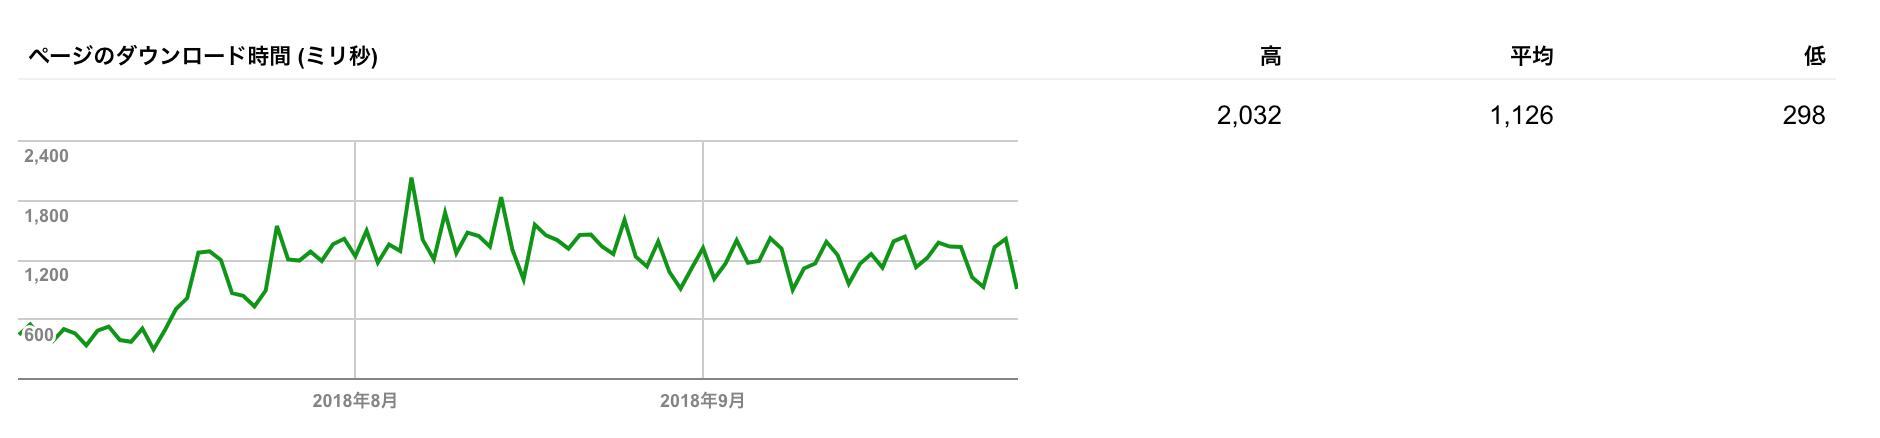 Search Console(旧)